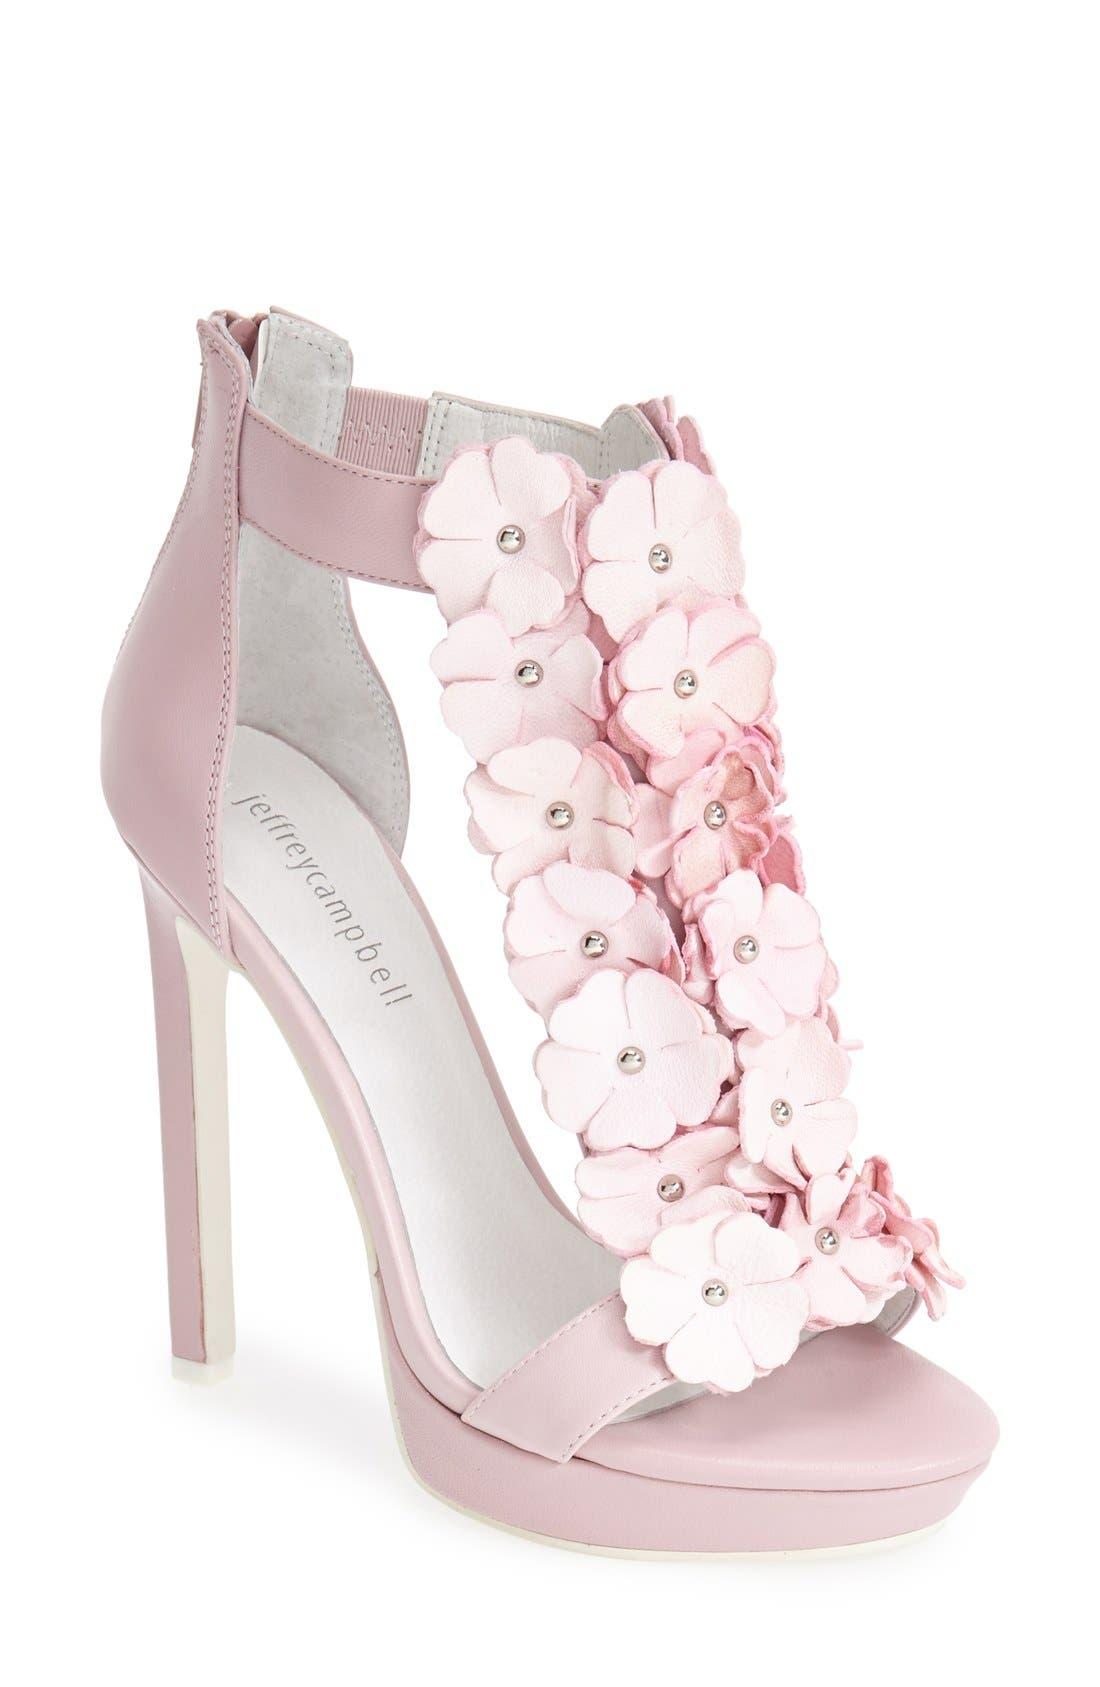 Main Image - Jeffrey Campbell 'Cilla-Rose' Platform Sandal (Women)